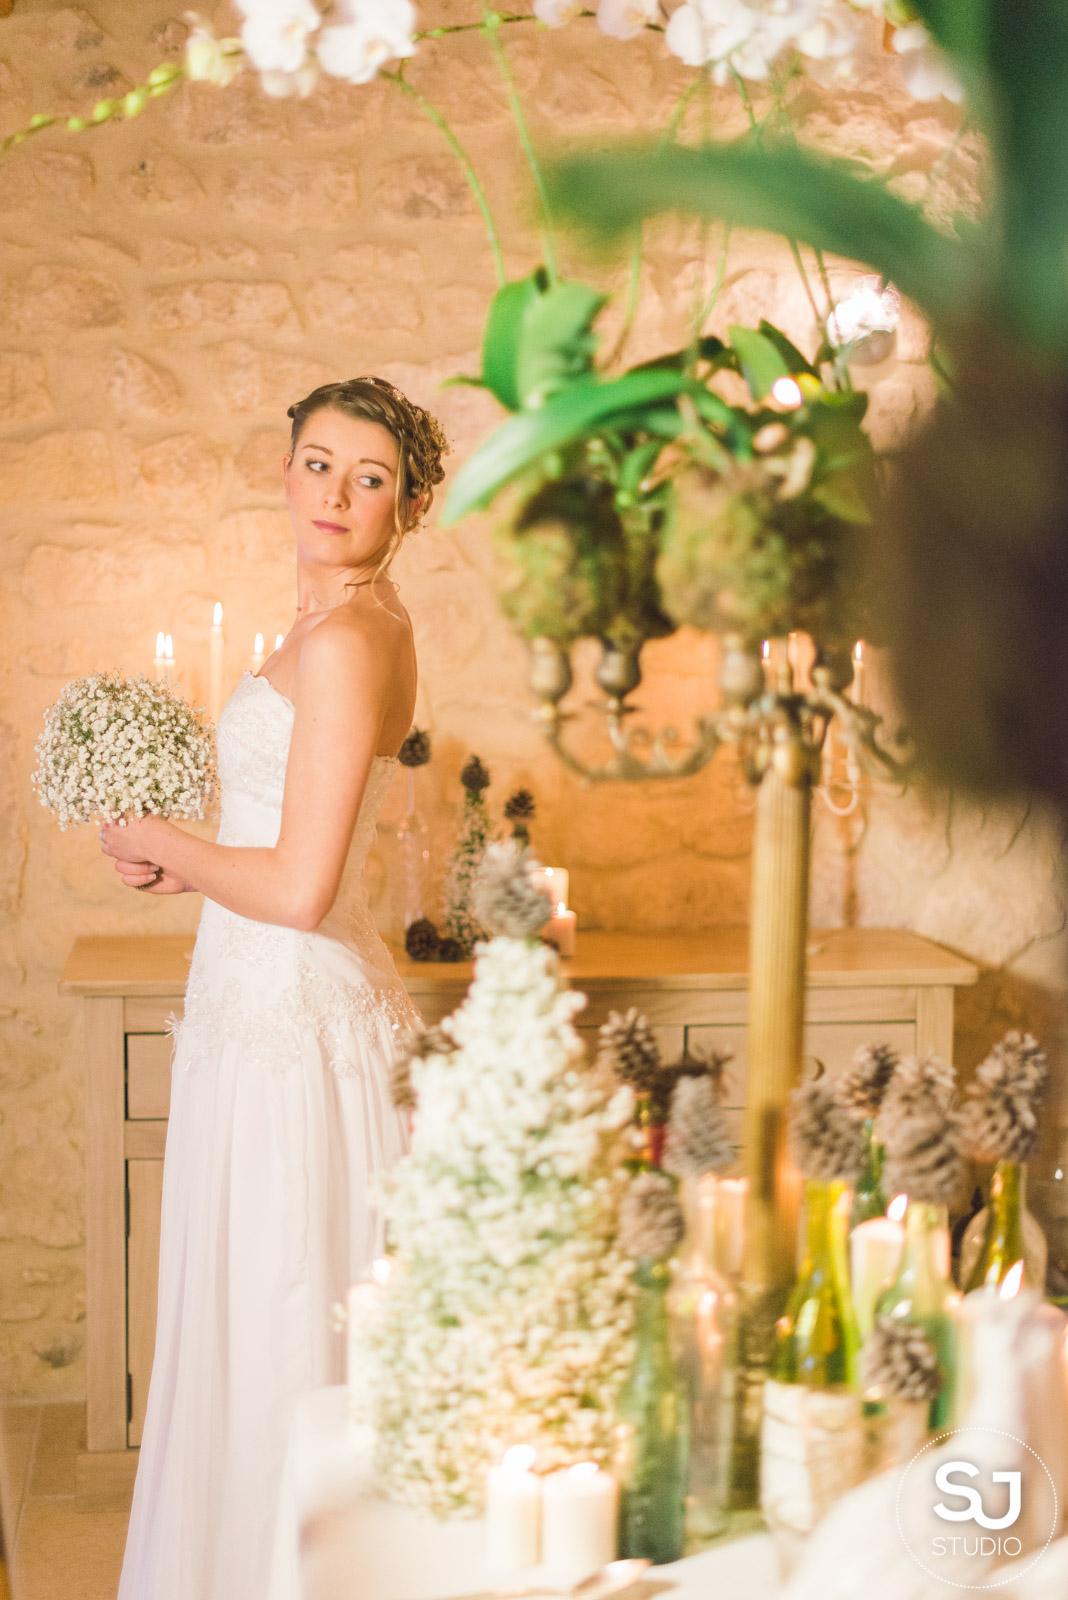 Photographe de mariage provence arles shooting d 39 inspiration - Photographe mariage salon de provence ...